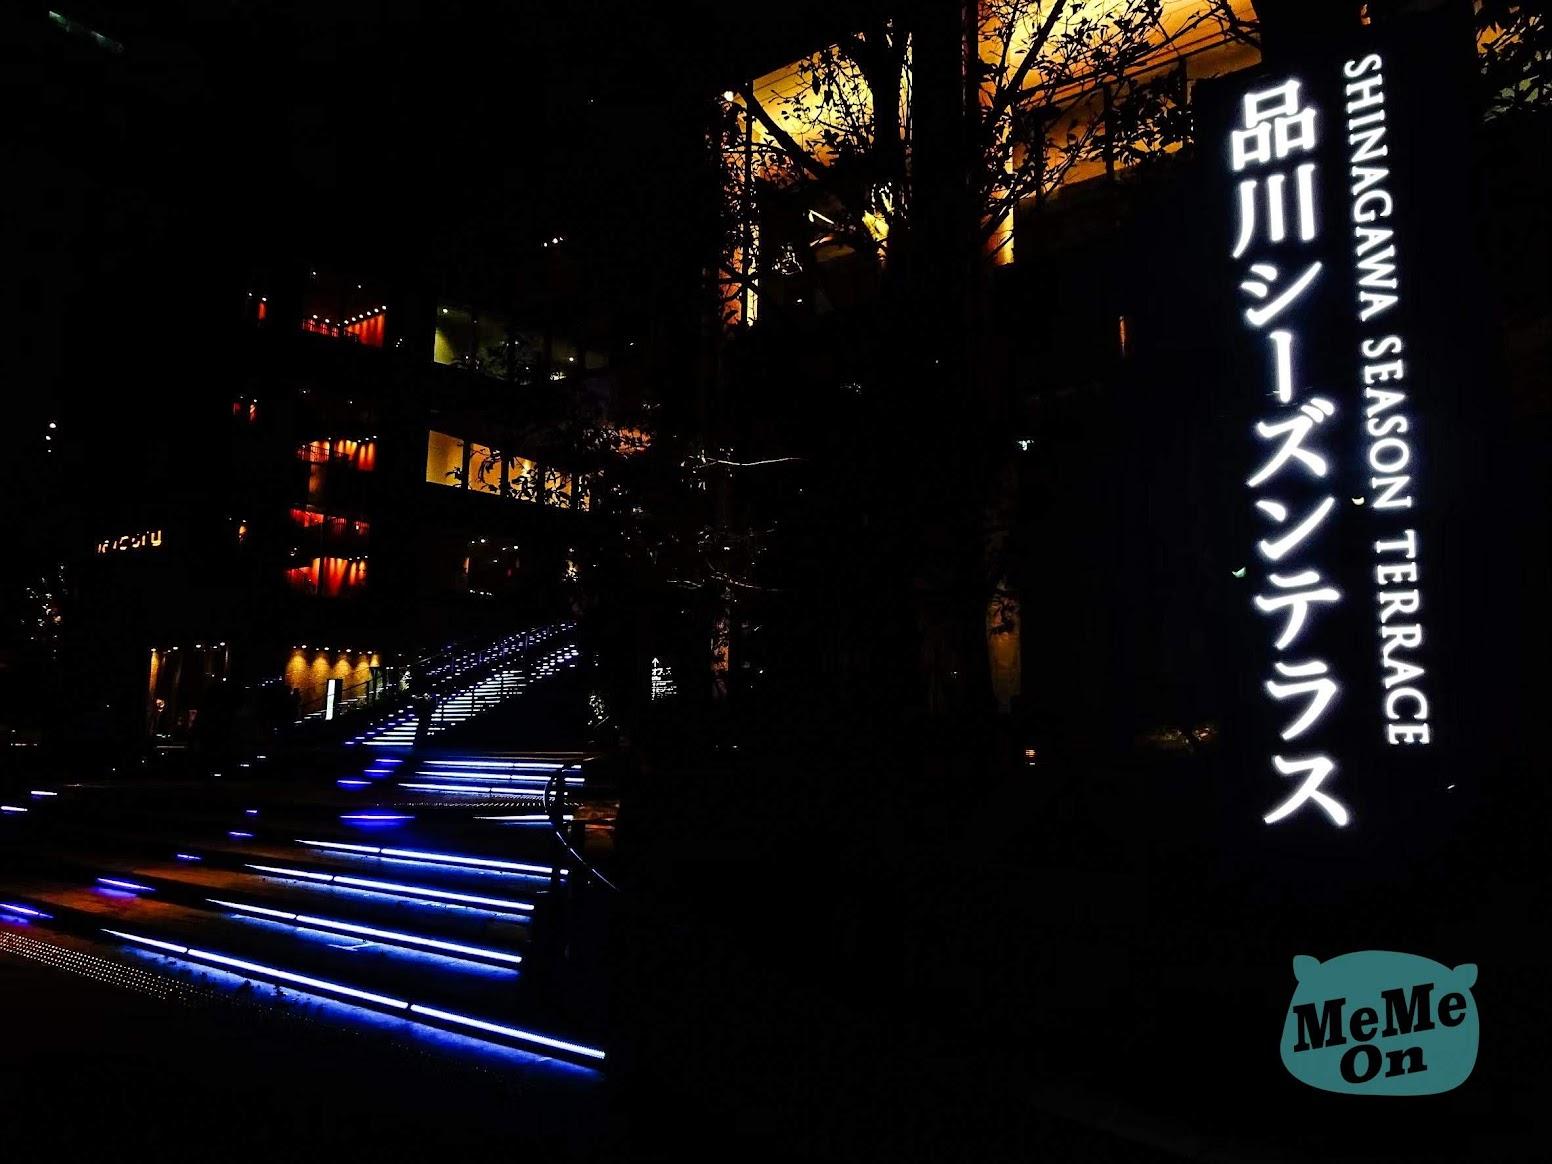 日劇拍攝勝地「 品川Season Terrace ( 品川シーズンテラス ) 」ー 東京白日夢女 、  我要準時下班 …都在這拍!